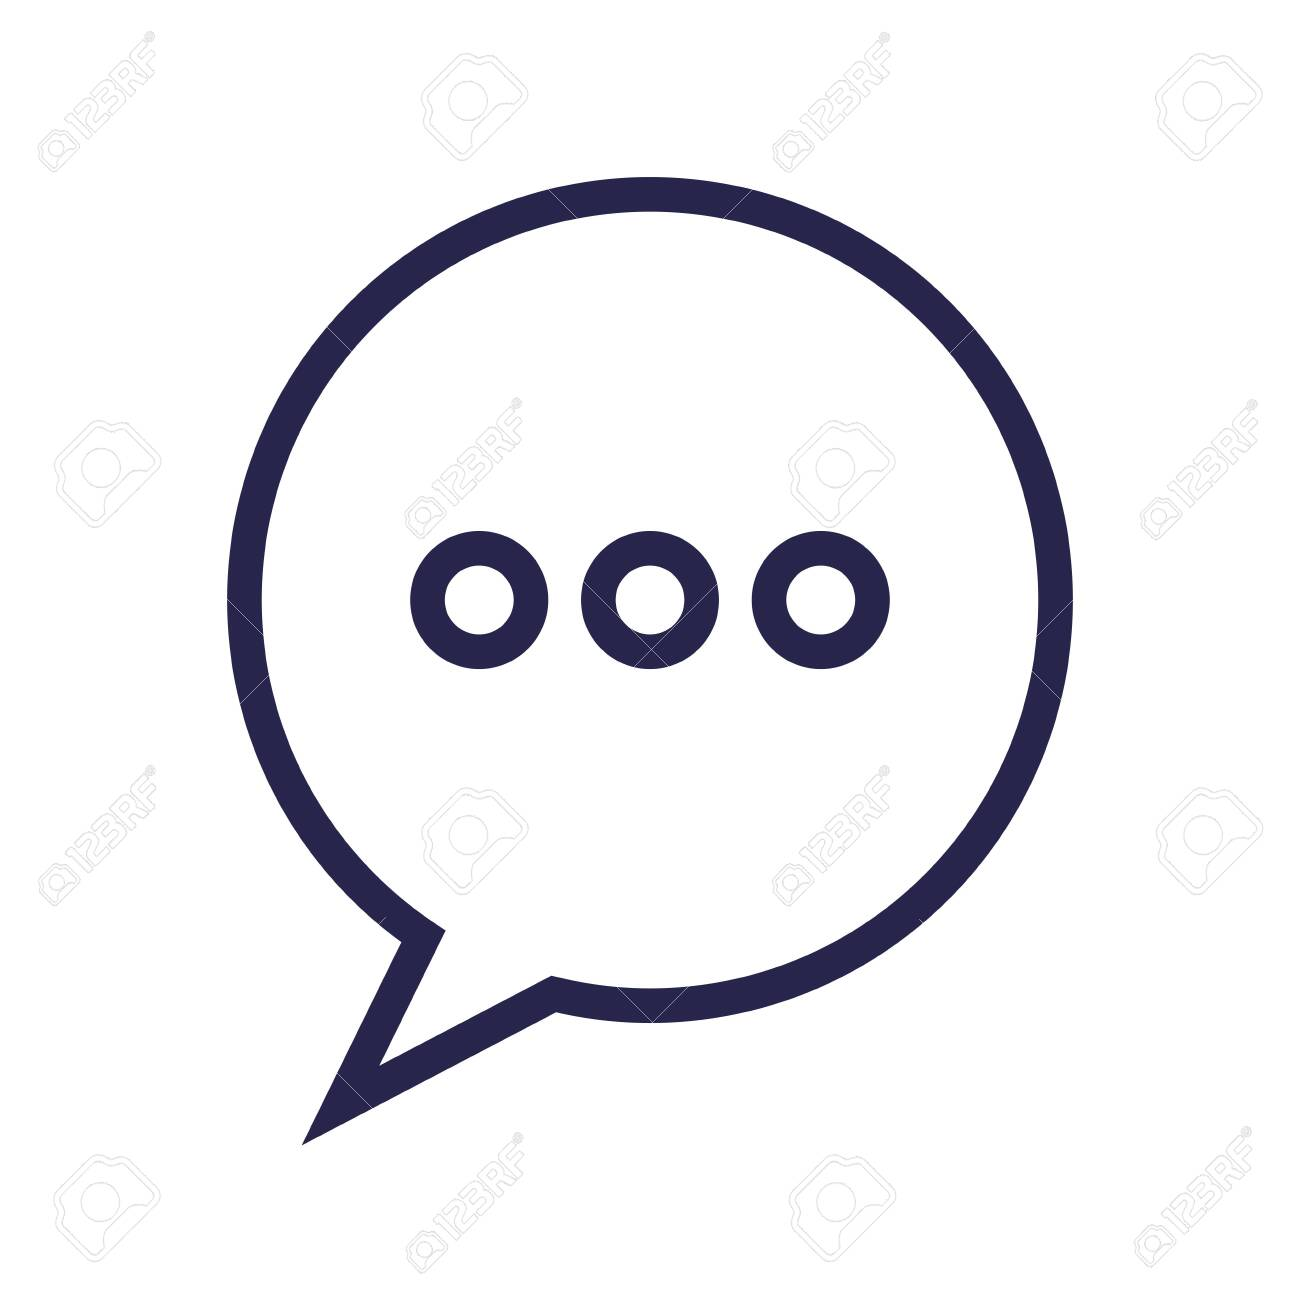 speech bubble message isolated icon vector illustration design - 129501192